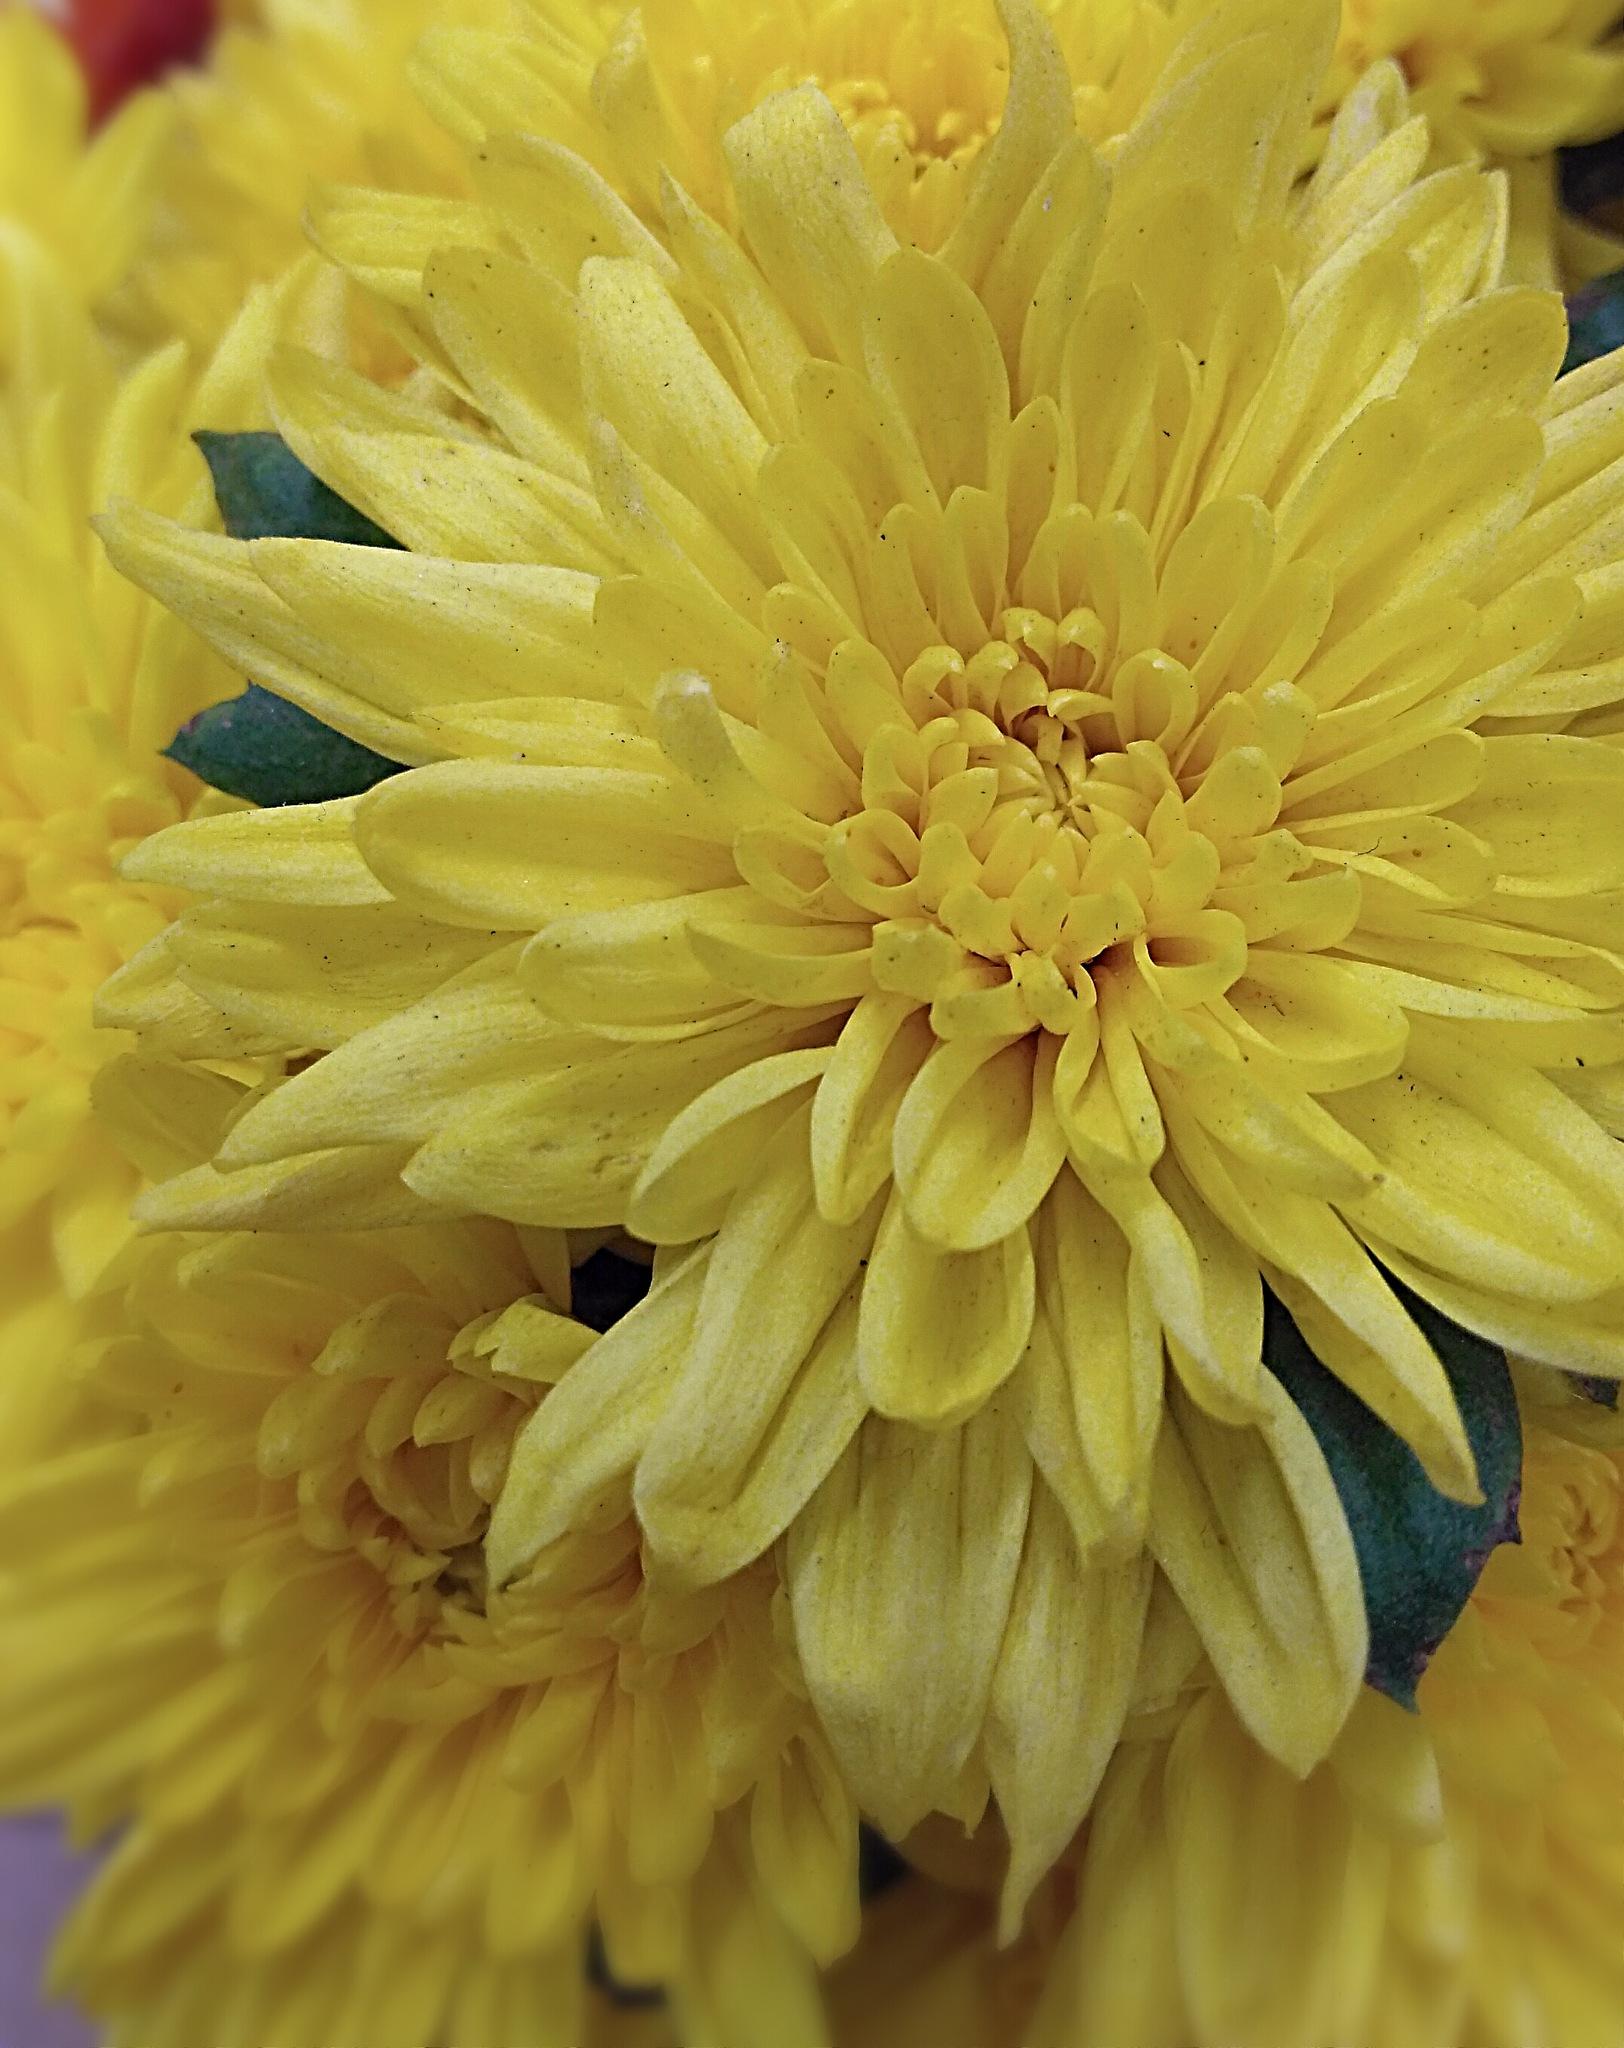 Yellow crisântemo. by Sirlei